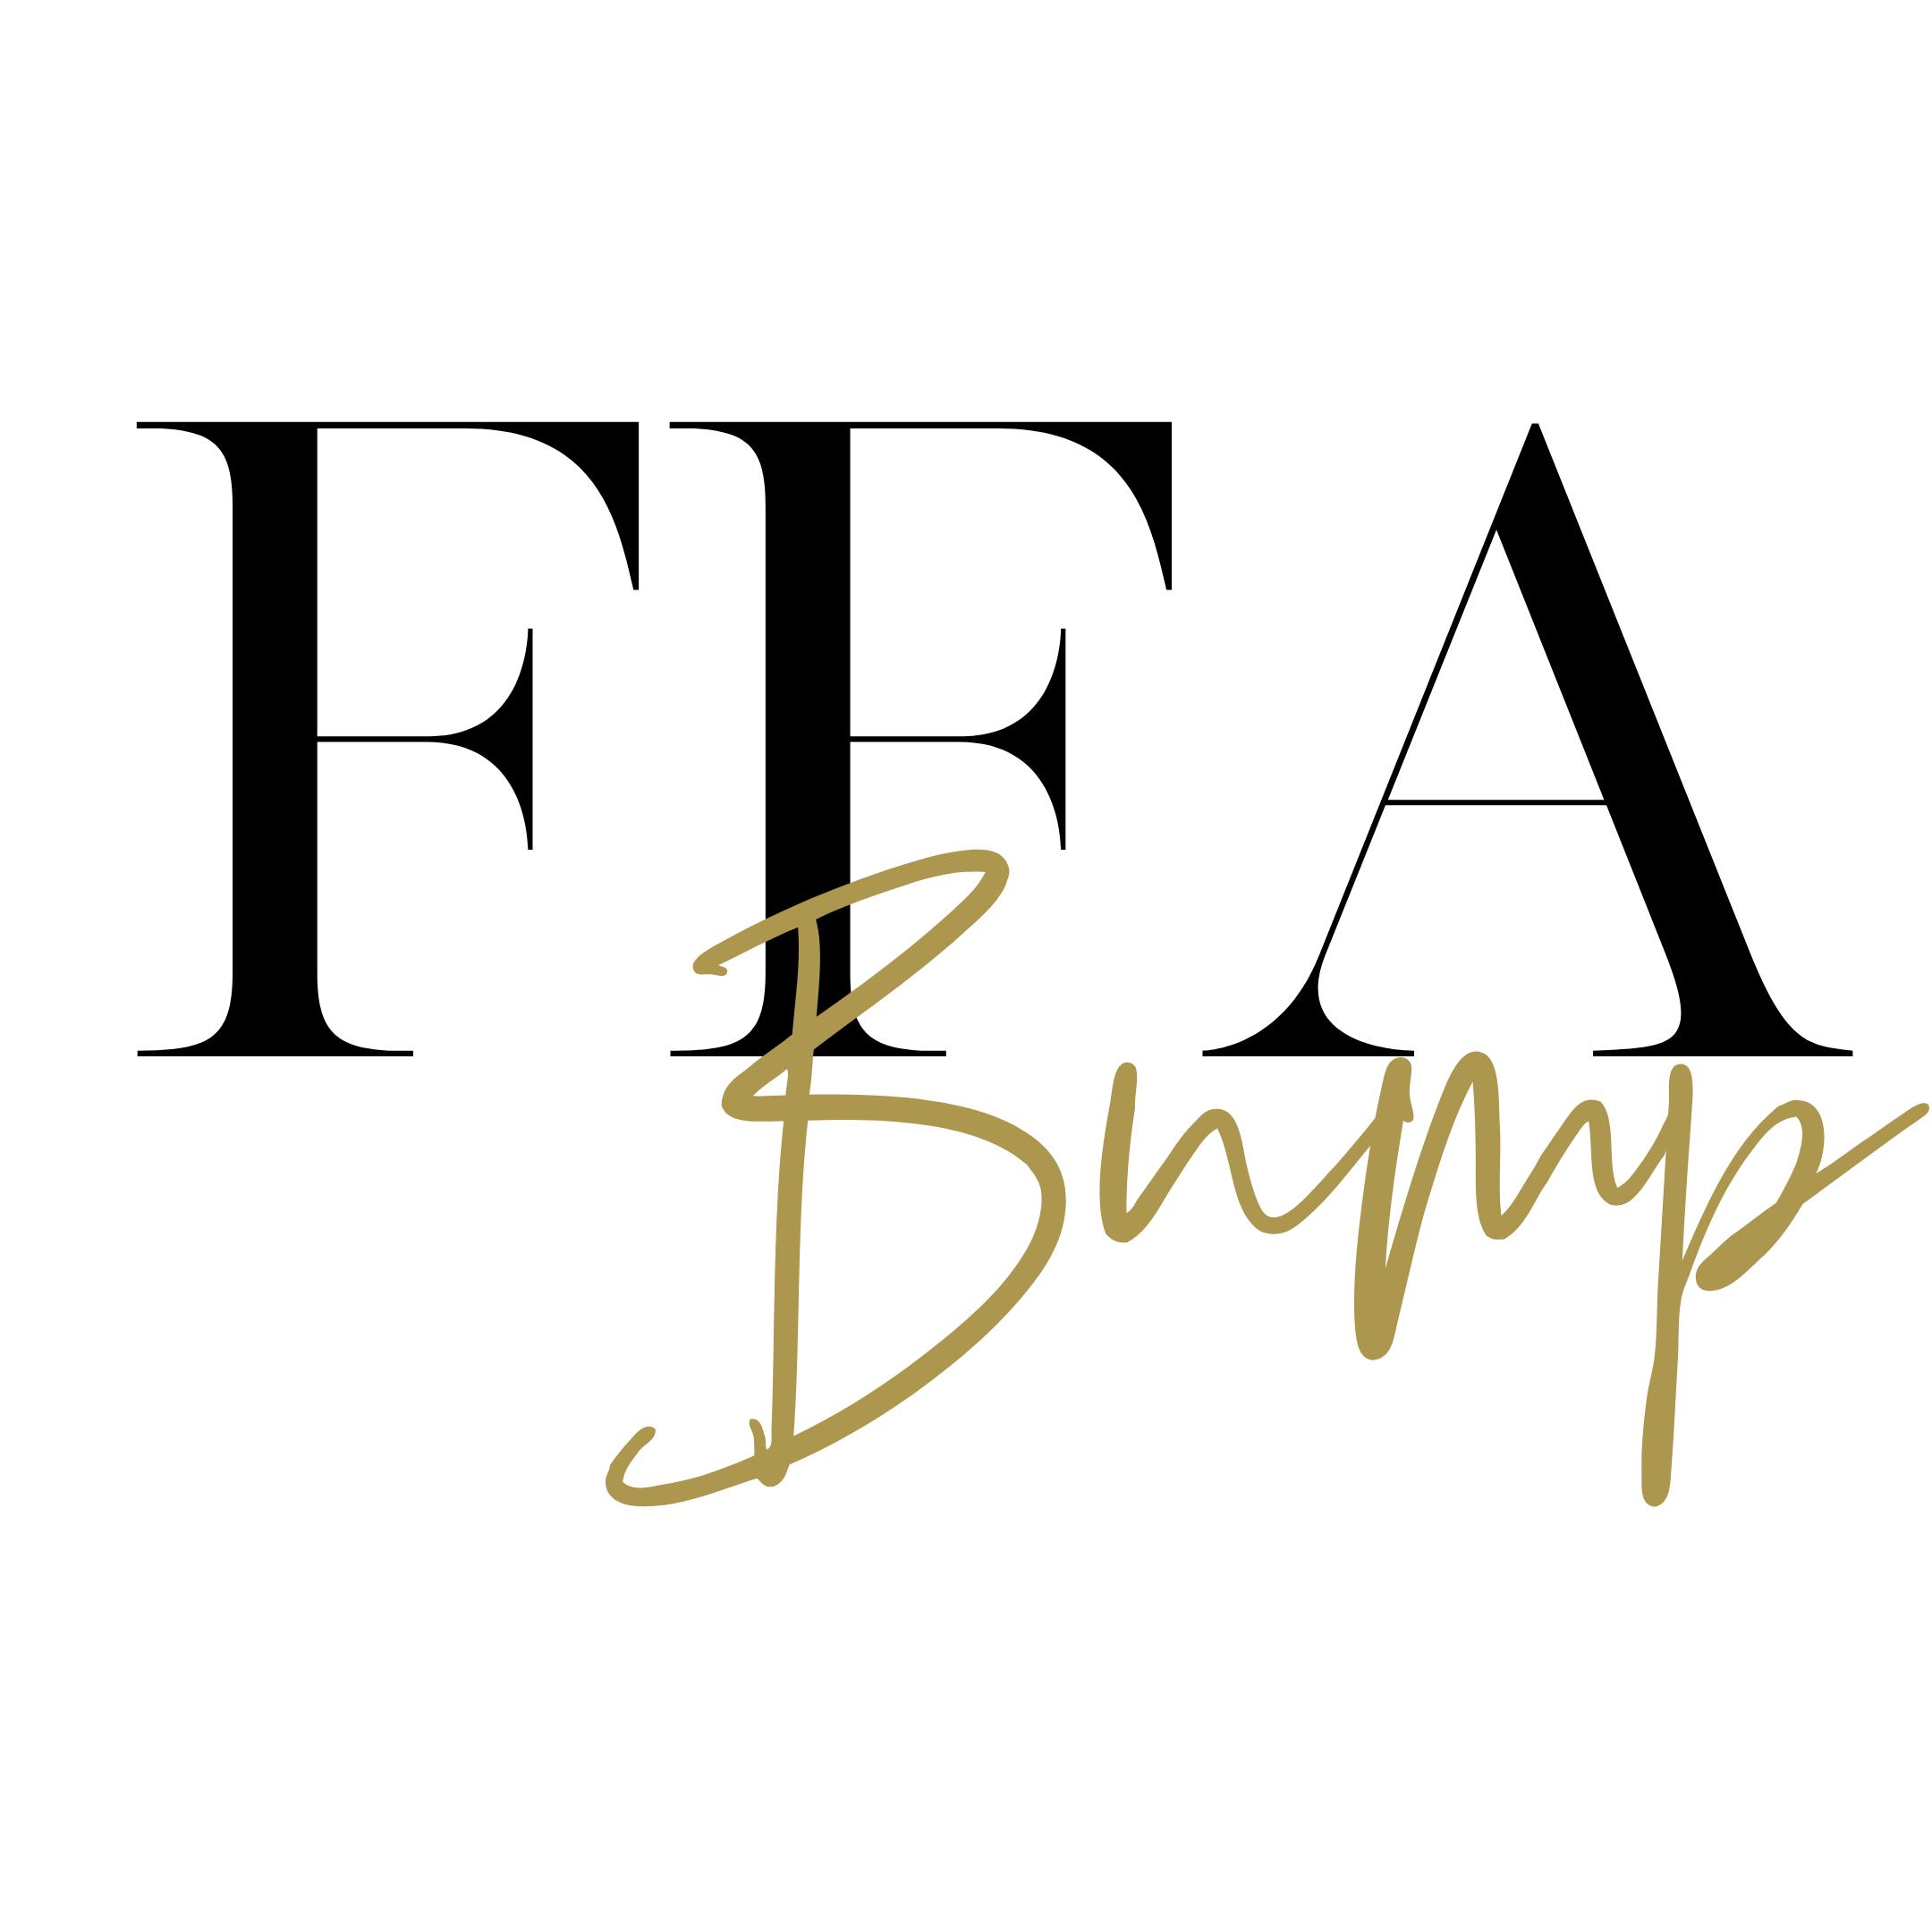 Category - FFA Bump